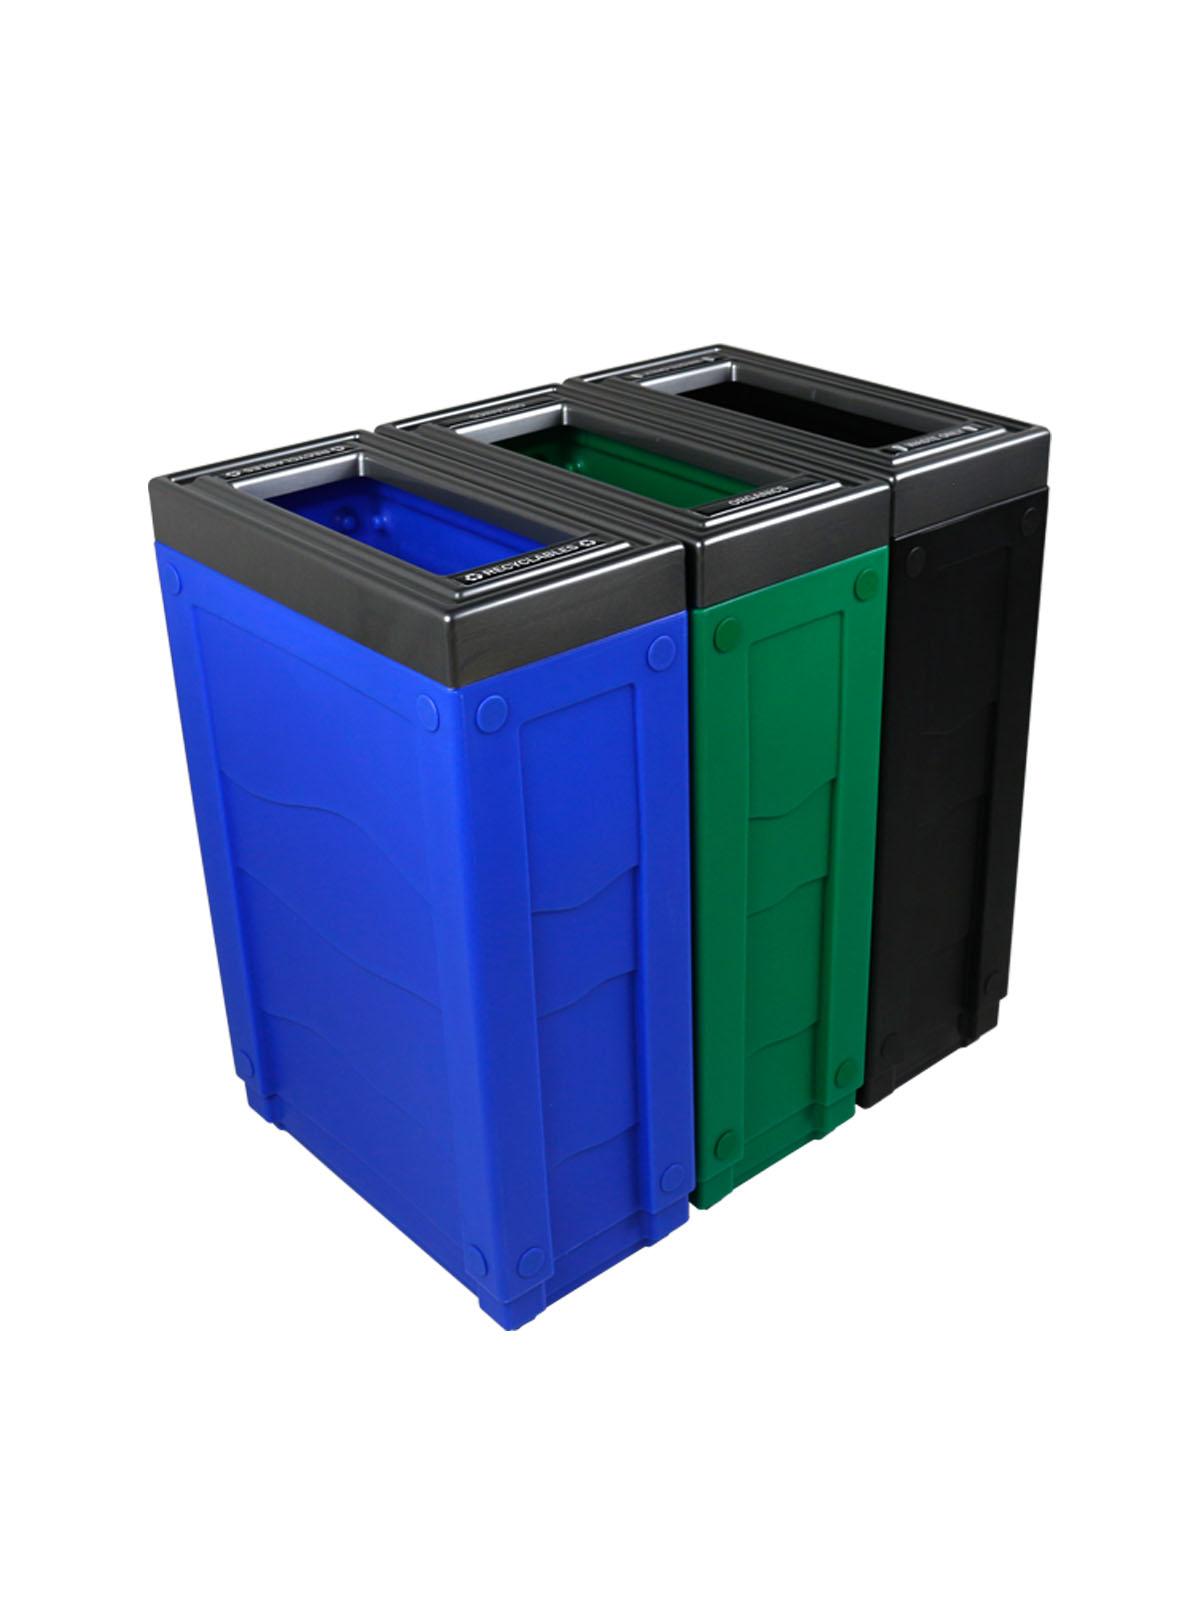 EVOLVE - Triple - Recyclables-Organics-Waste - Full - Blue-Green-Black